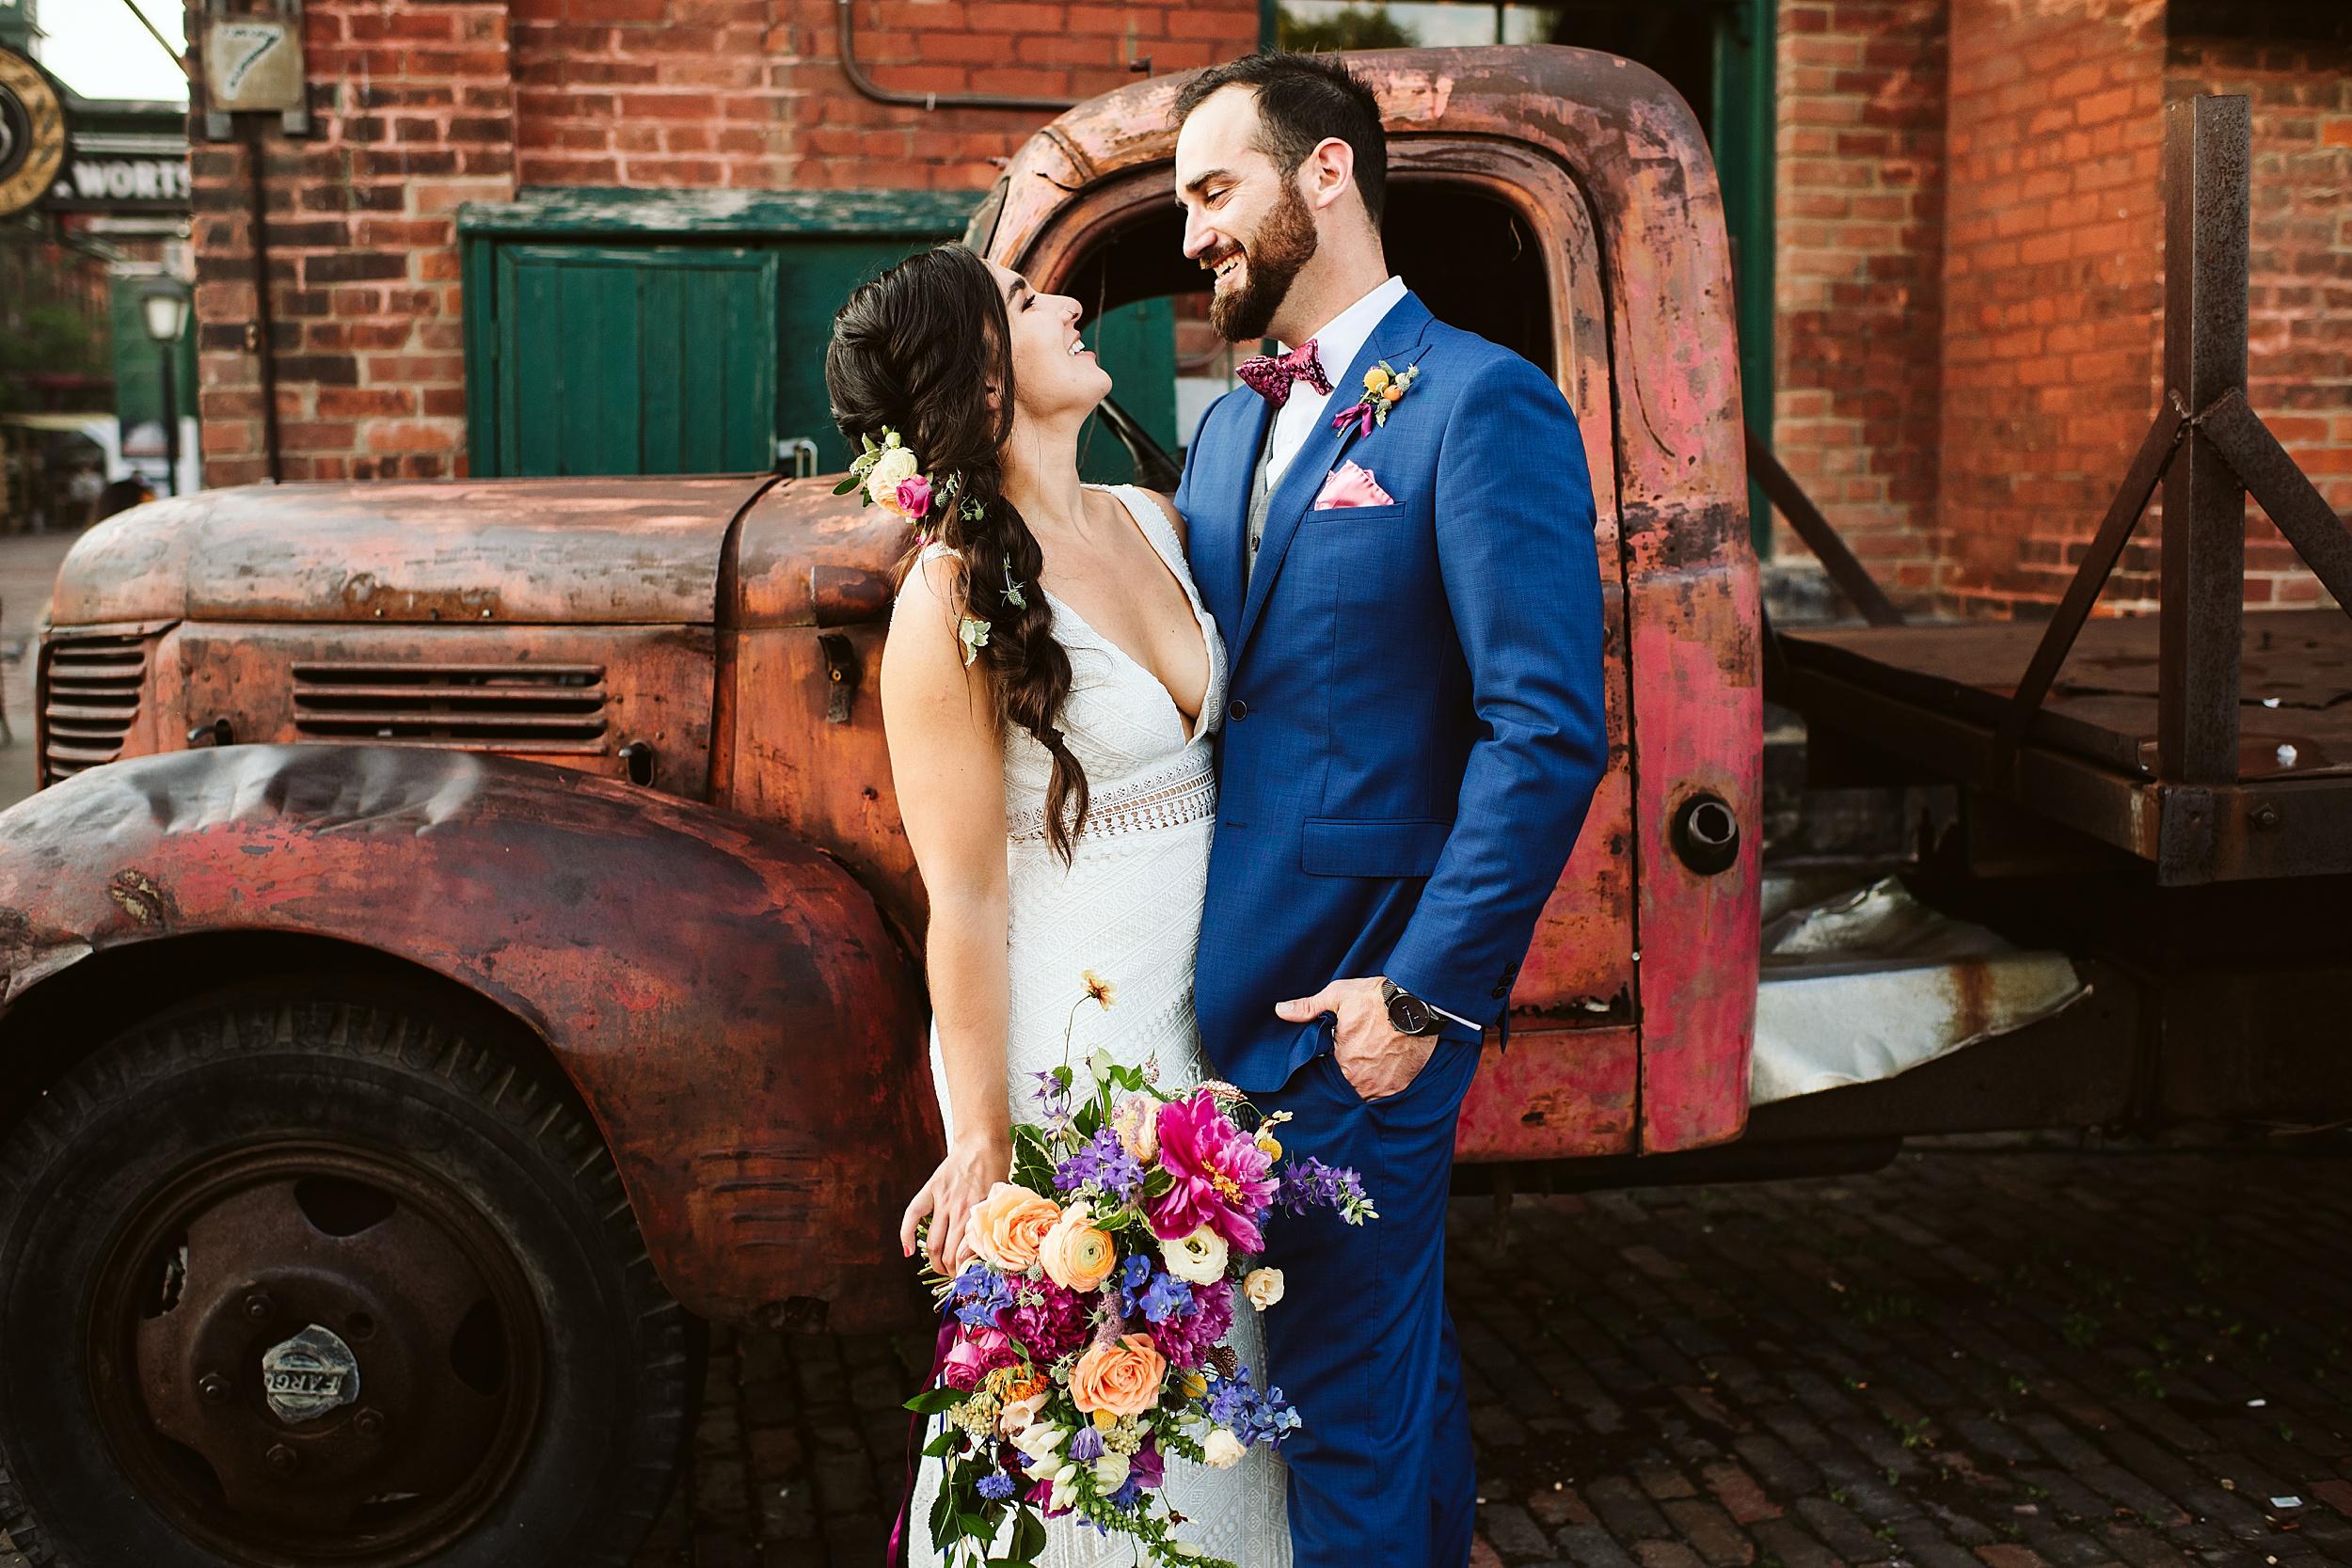 Airship-37-Berkeley-Events-Distillery-District-Wedding-Toronto-Wedding-Photographers_0036.jpg